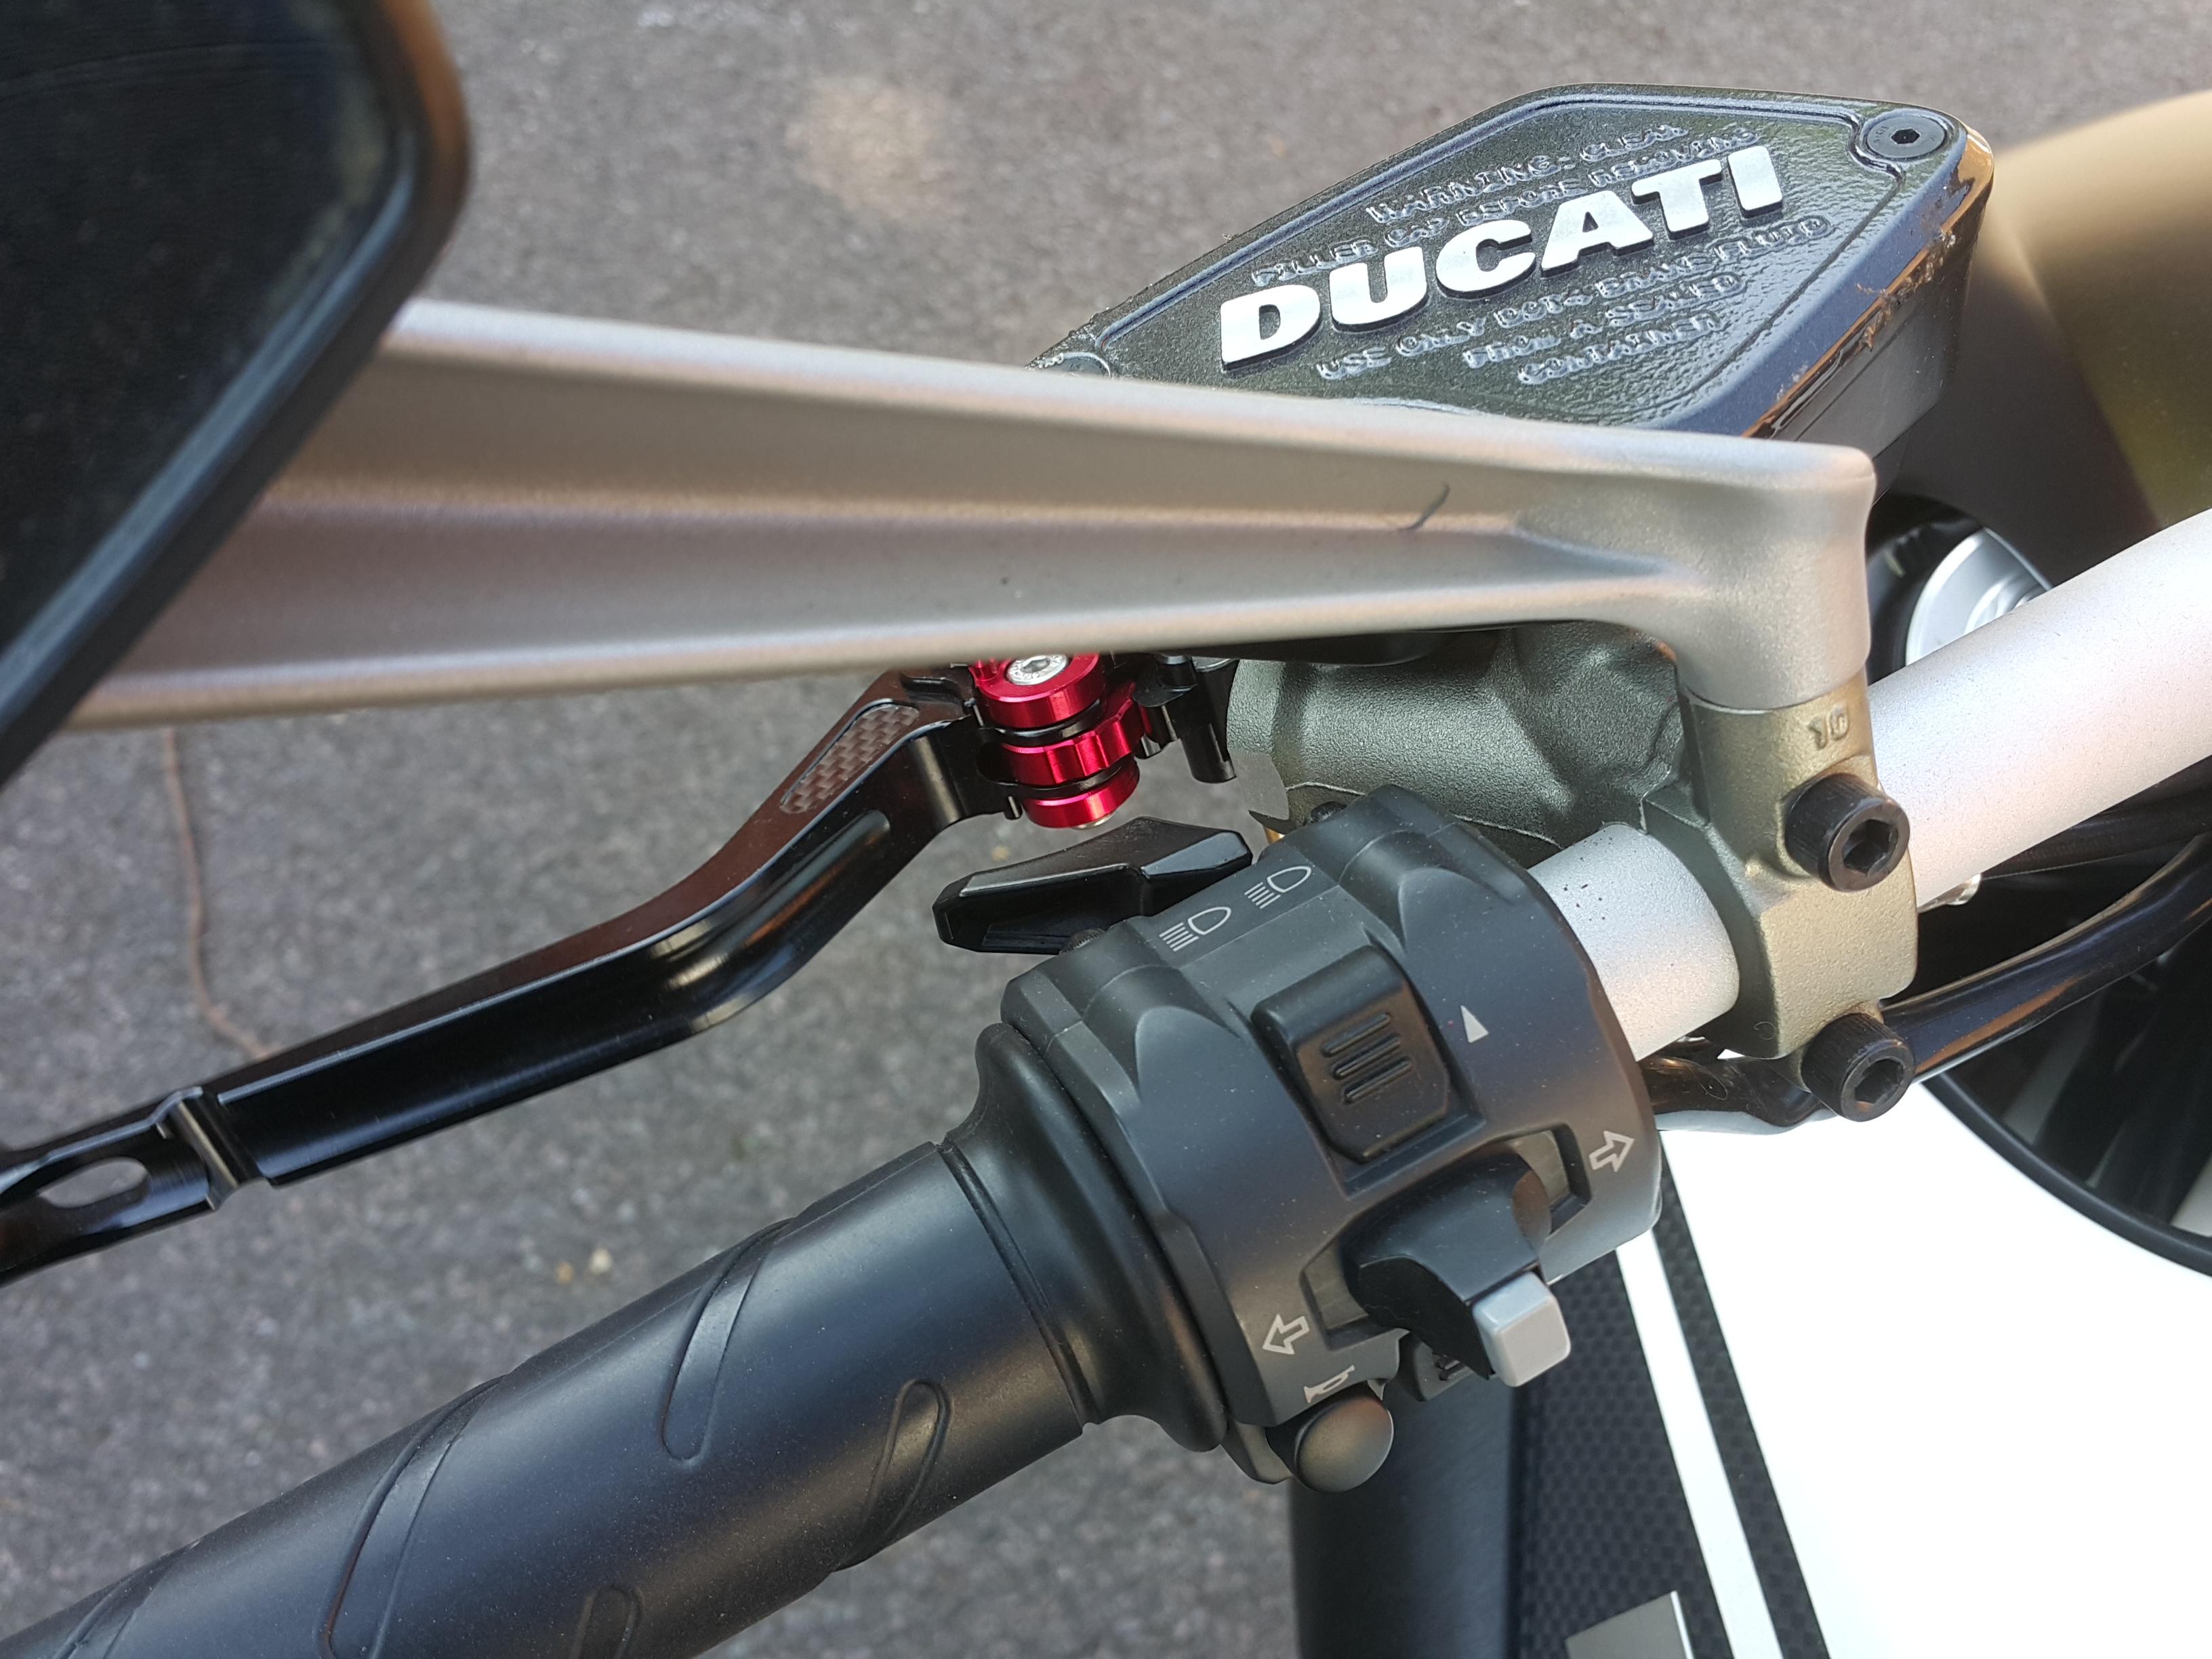 Ducati Diavel Amg For Sale Uk